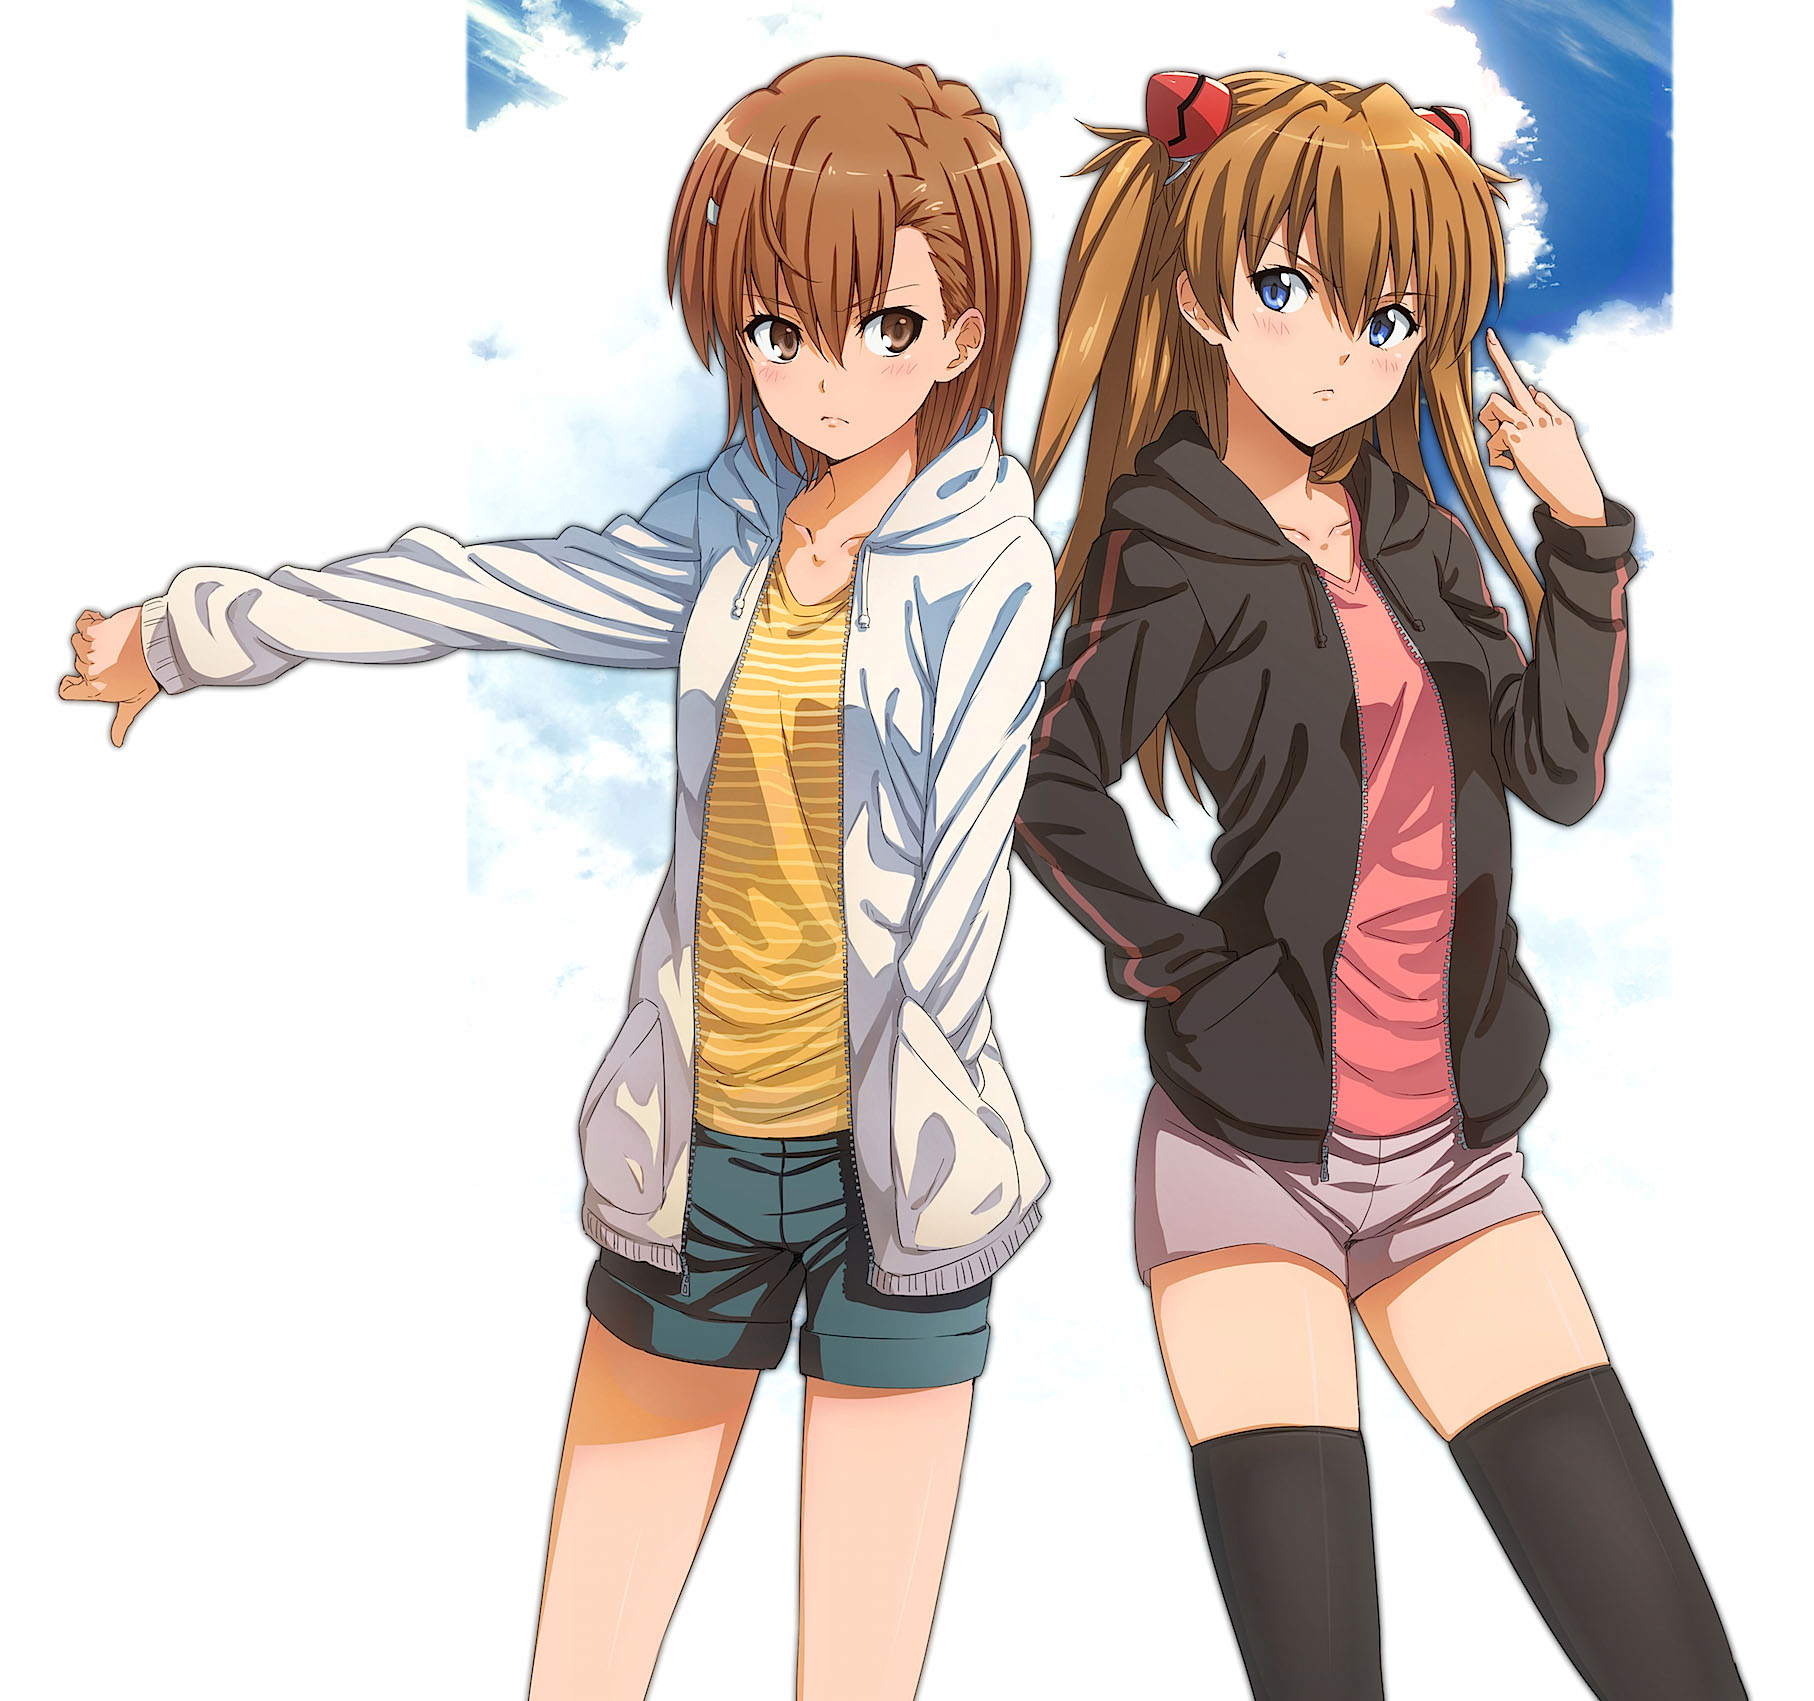 Anime Misaka Mikoto ToAru asuka langley soryu 2519812